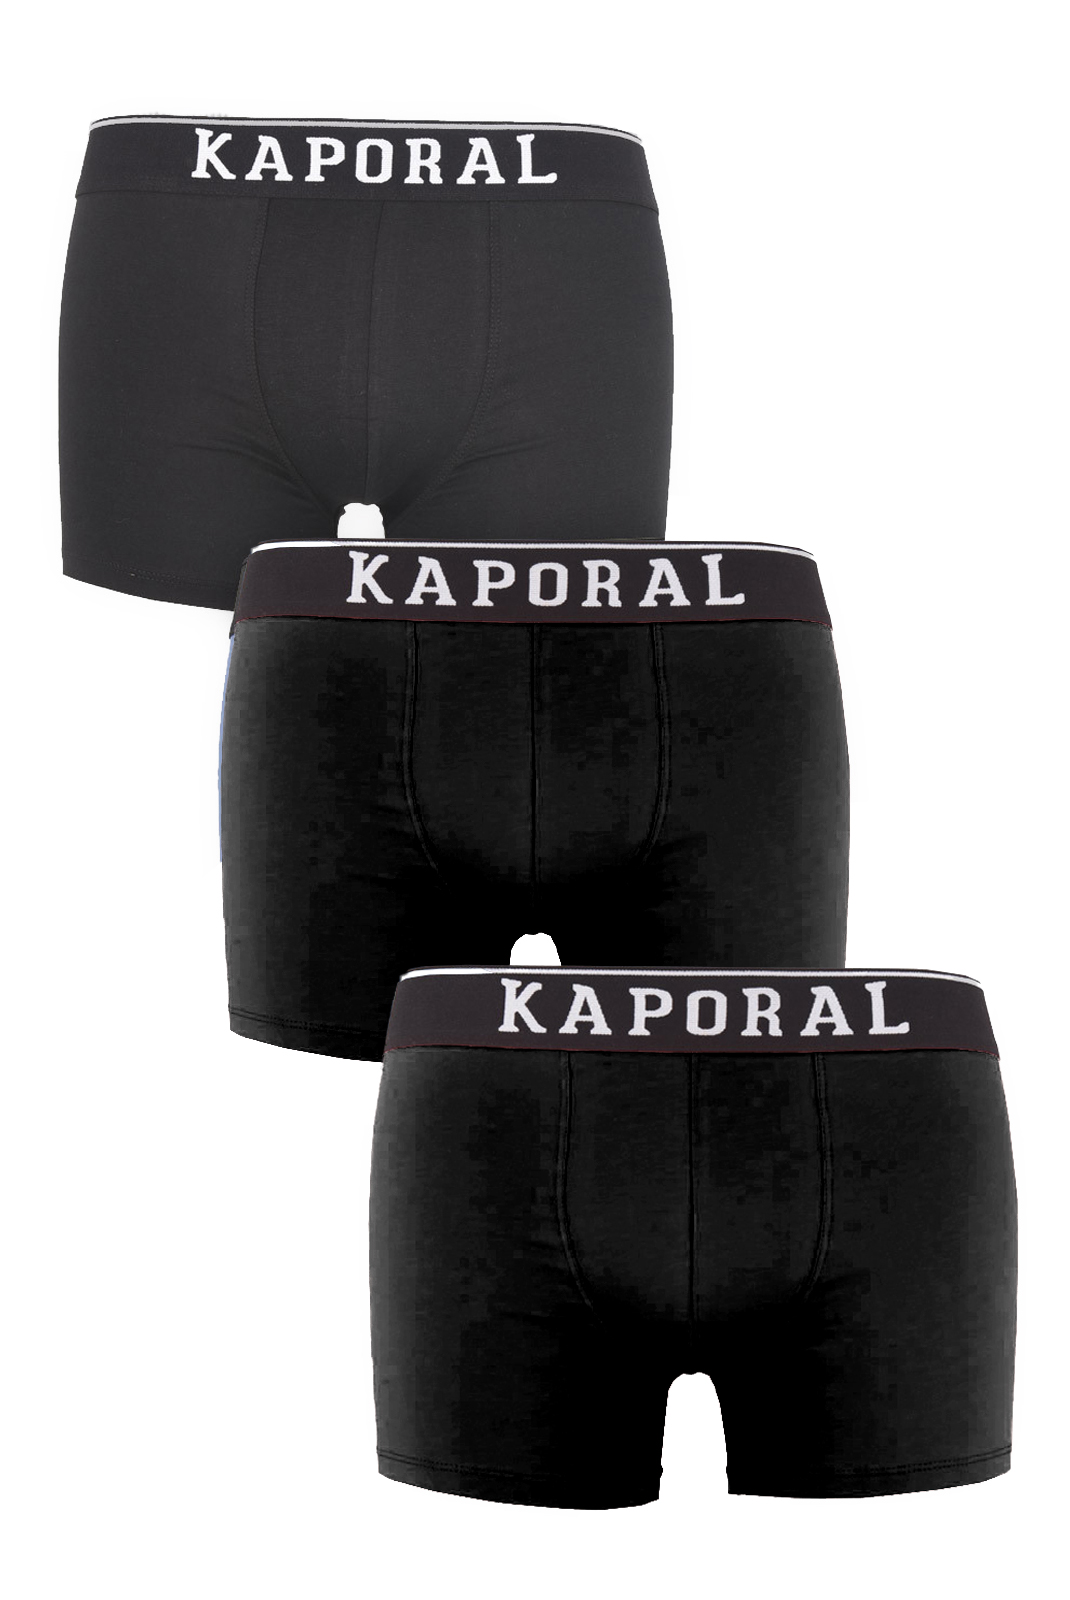 Slips-Caleçons  Kaporal QUAD BLACK